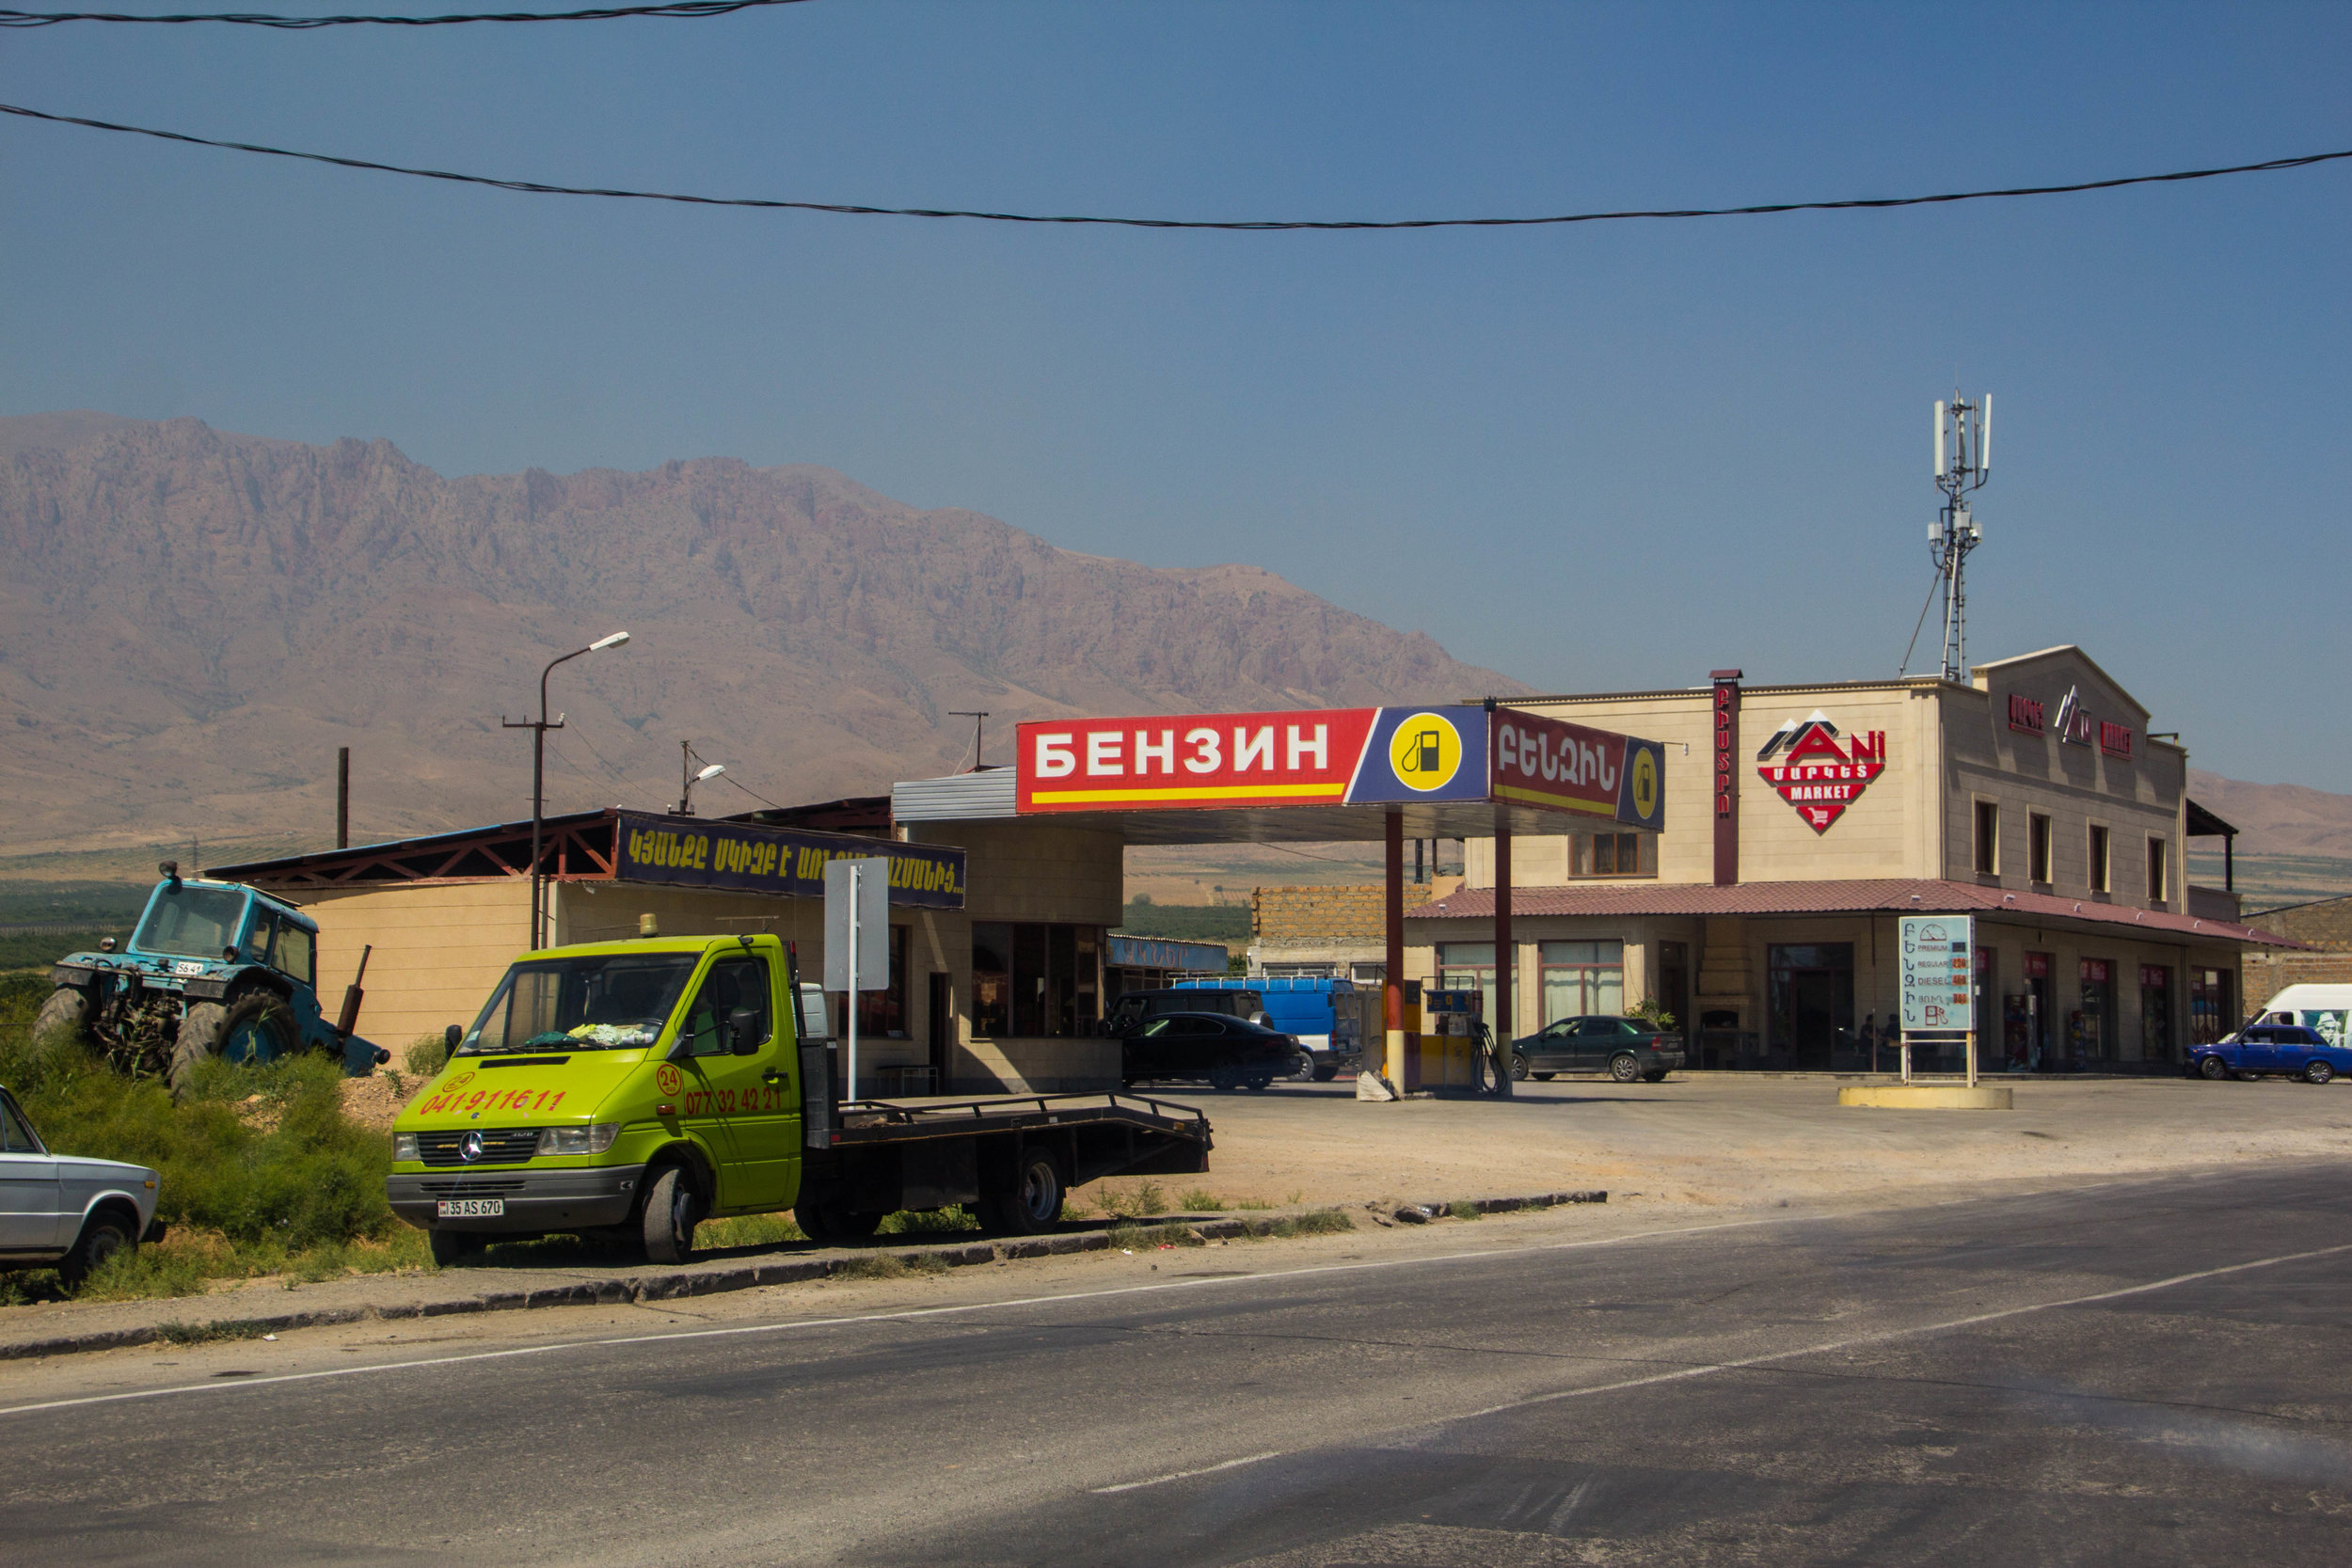 armenia-azerbaijan-southern-border-8.jpg